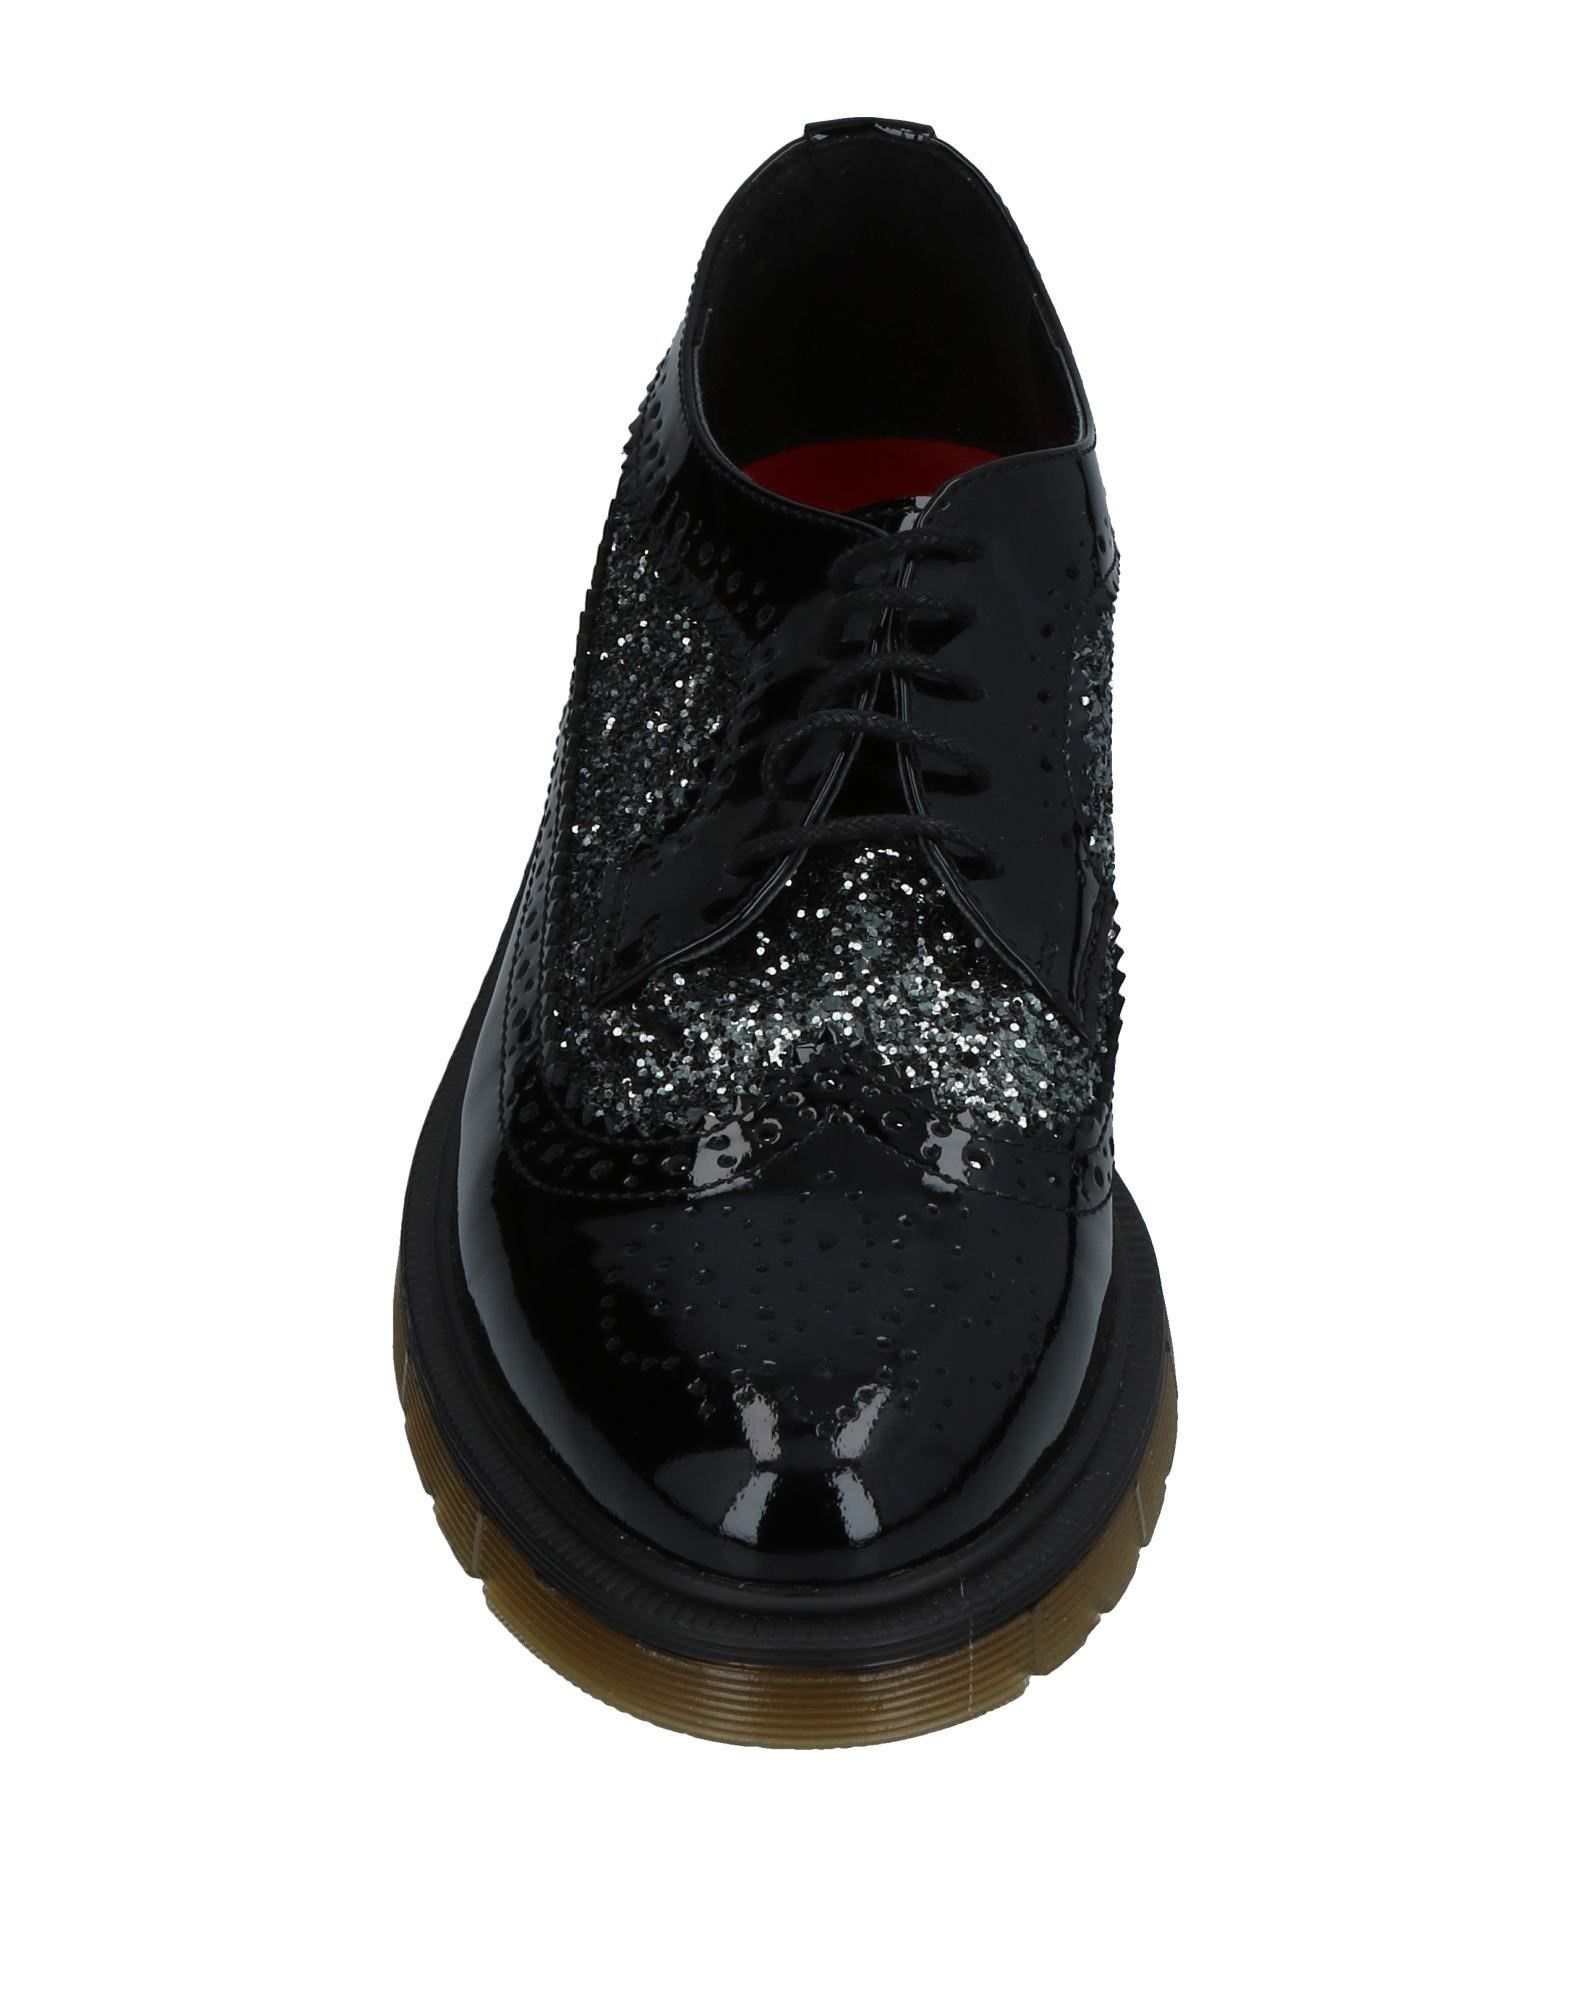 Chaussures À Lacets Penelope Femme - Chaussures À Lacets Penelope sur